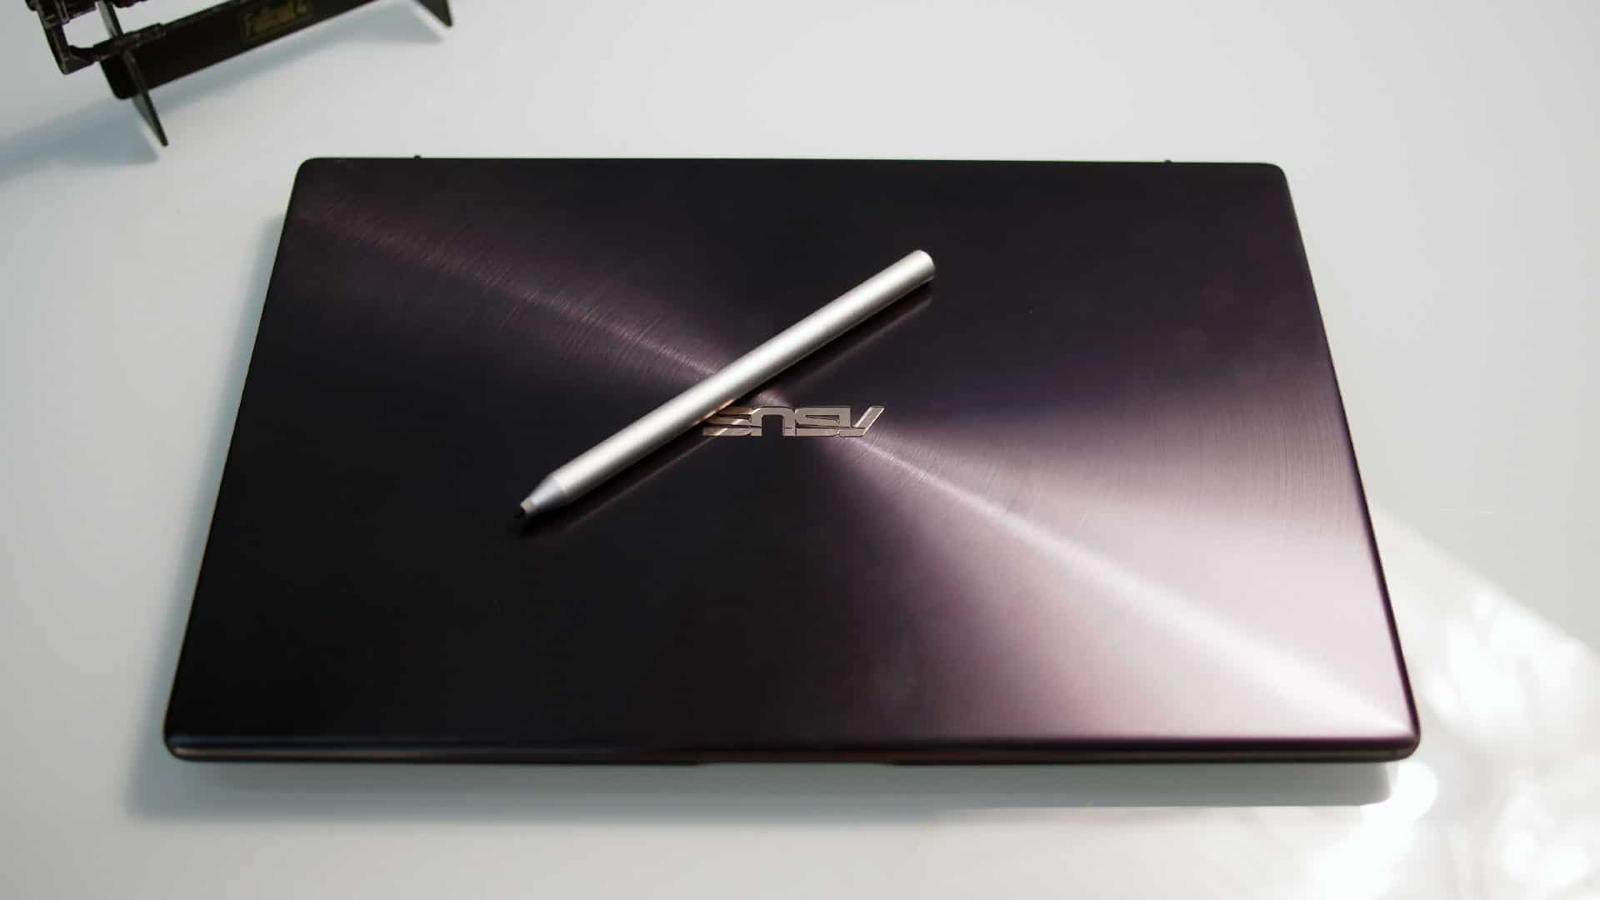 Asus Zenbook S UX391U Review 1